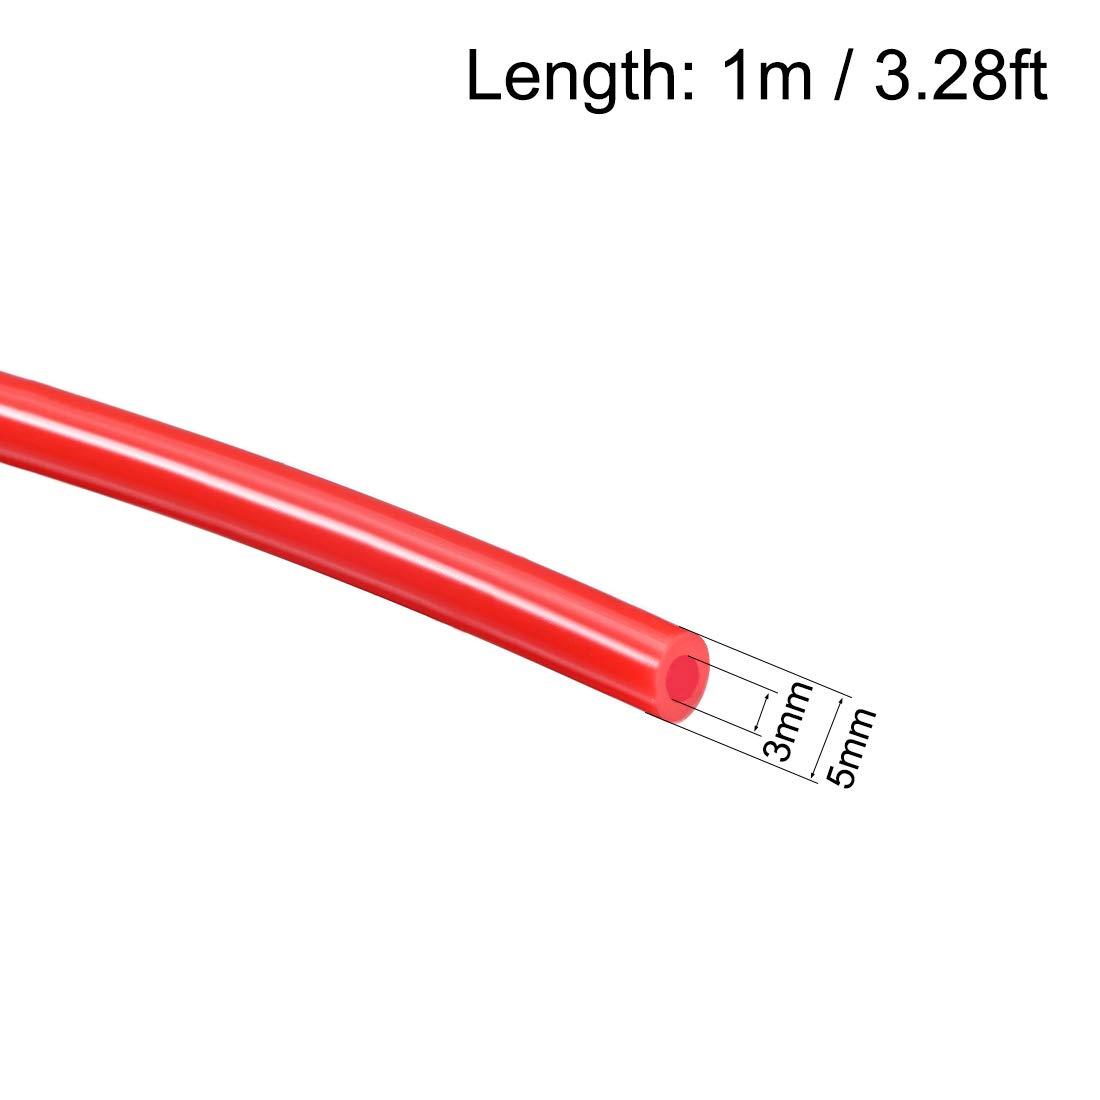 sourcing map Tubo de silicona 3 mm ID X 5 mm OD 3.28 pies 1 m Tubo flexible de caucho de silicona Tubo de manguera de aire para transferencia de bomba Rojo